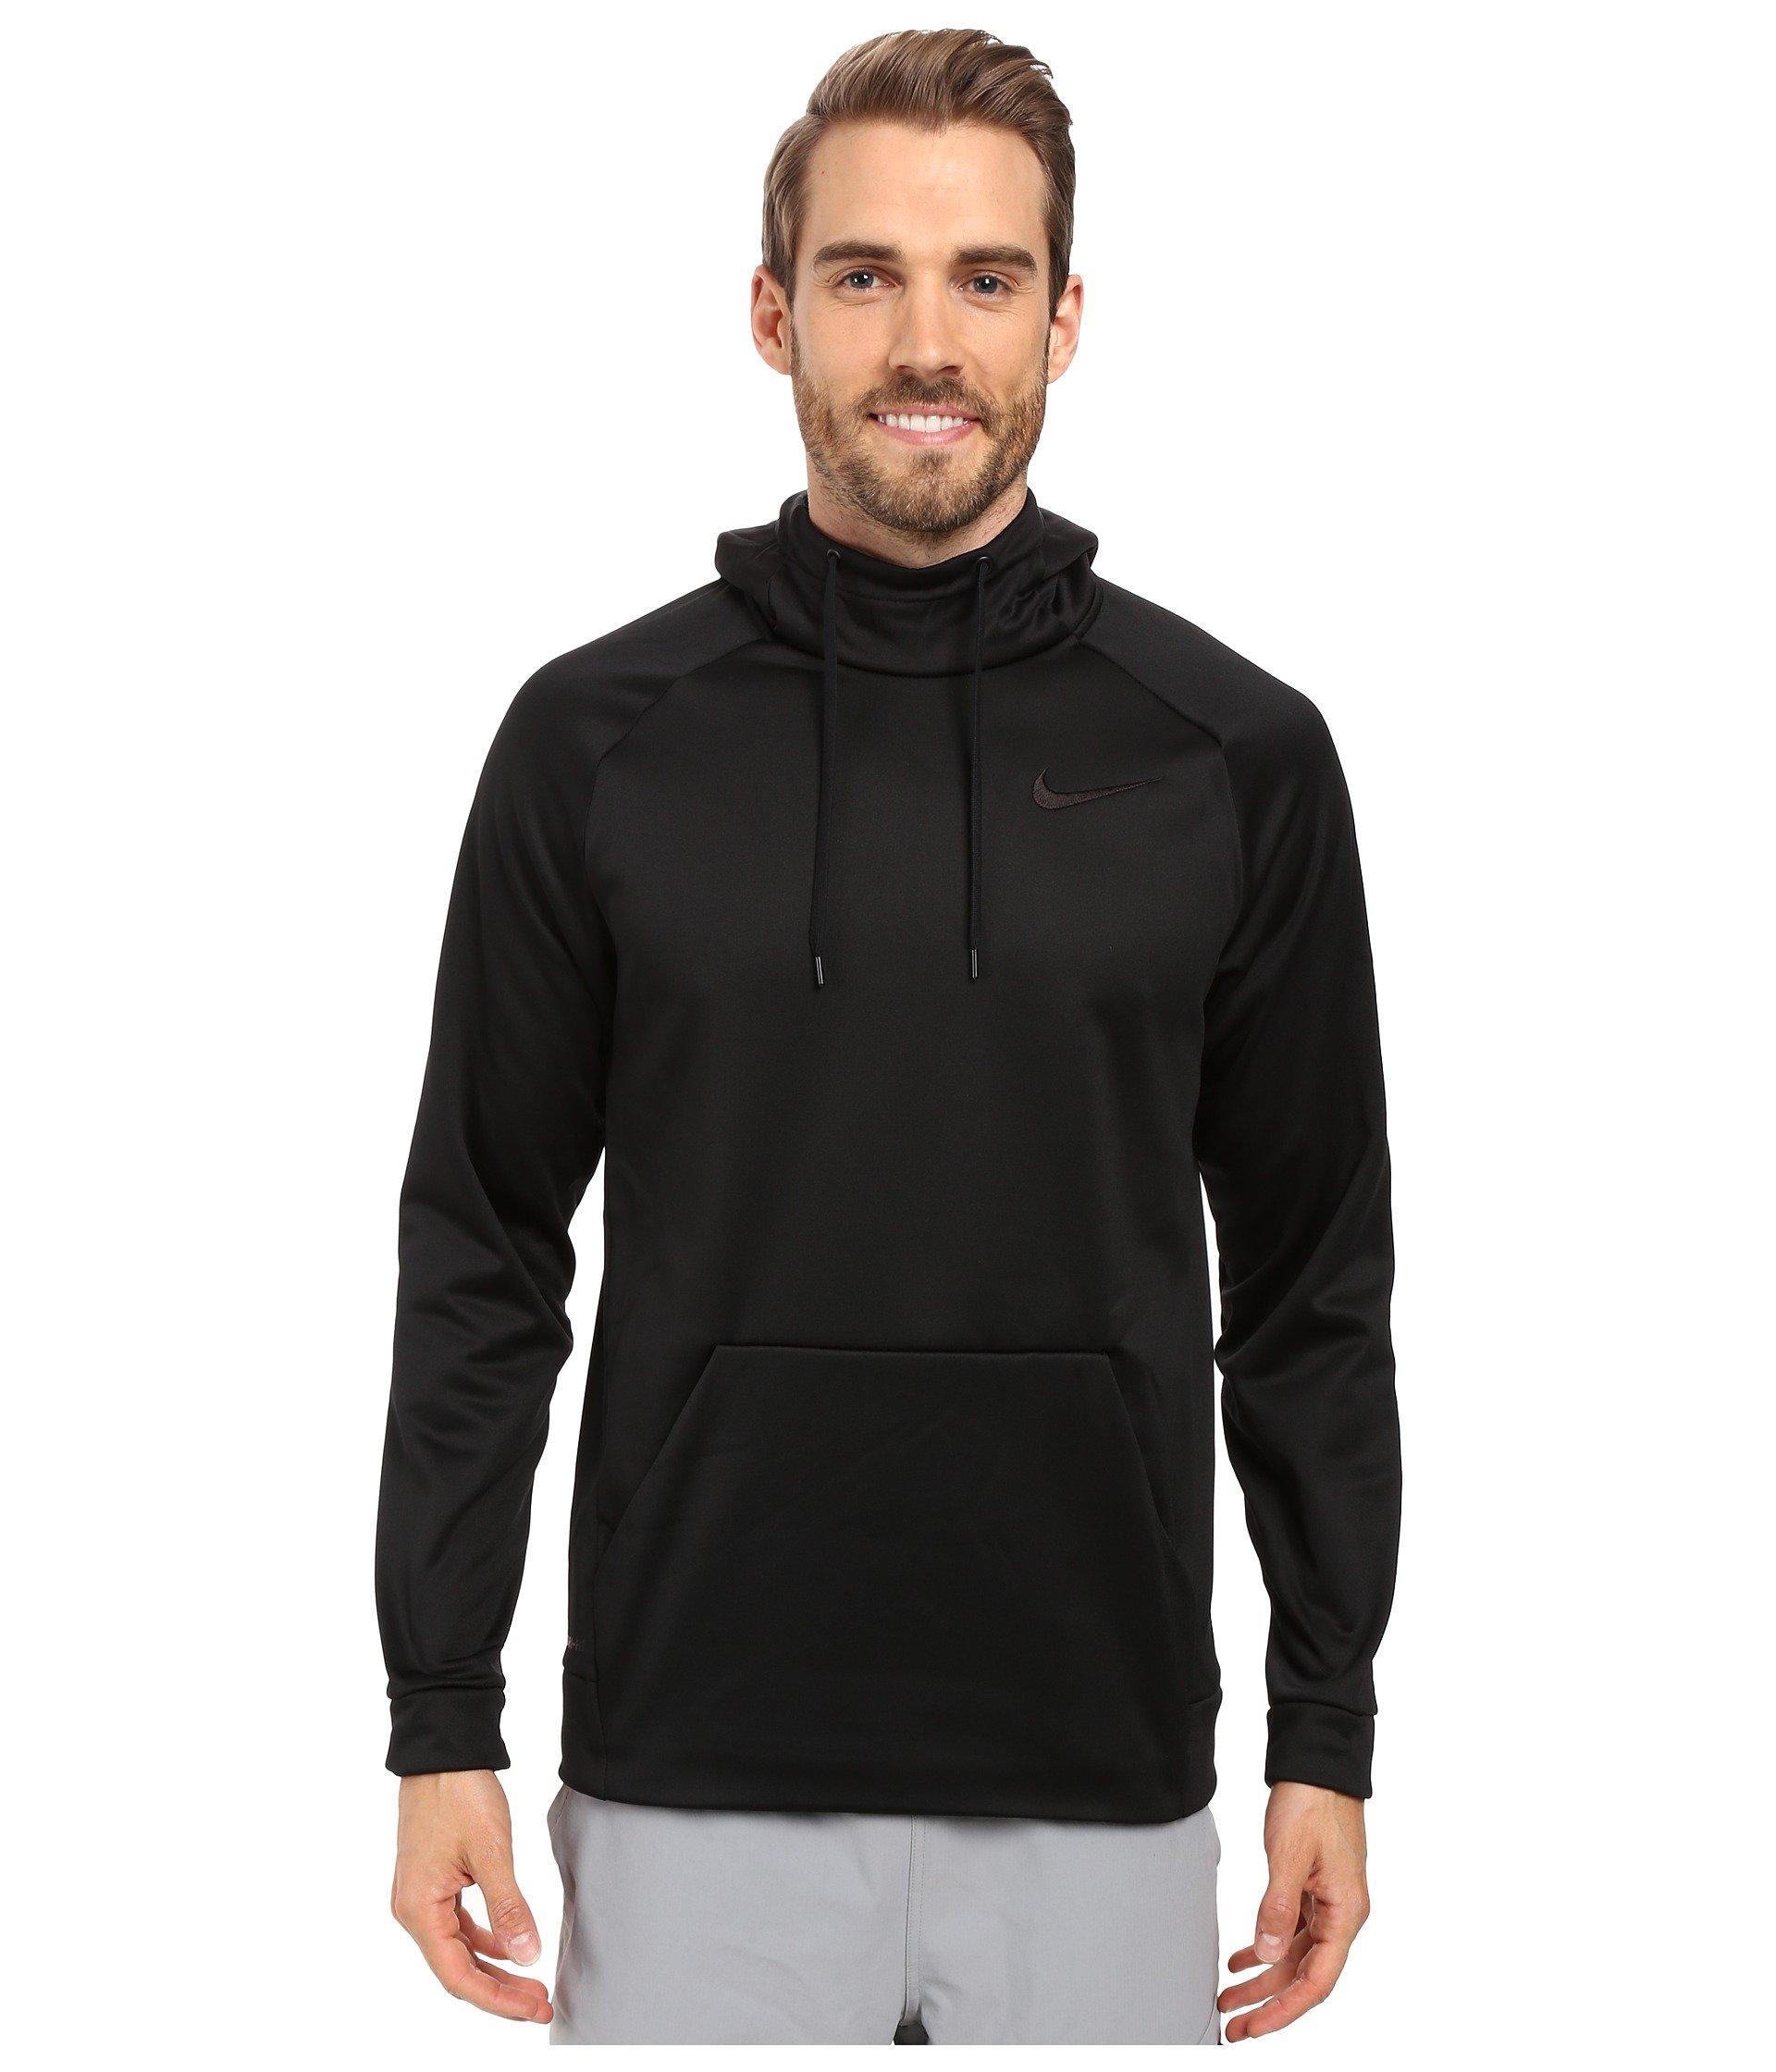 Nike Men's Therma Training Hoodie Black/Dark Grey Size XX-Large by Nike